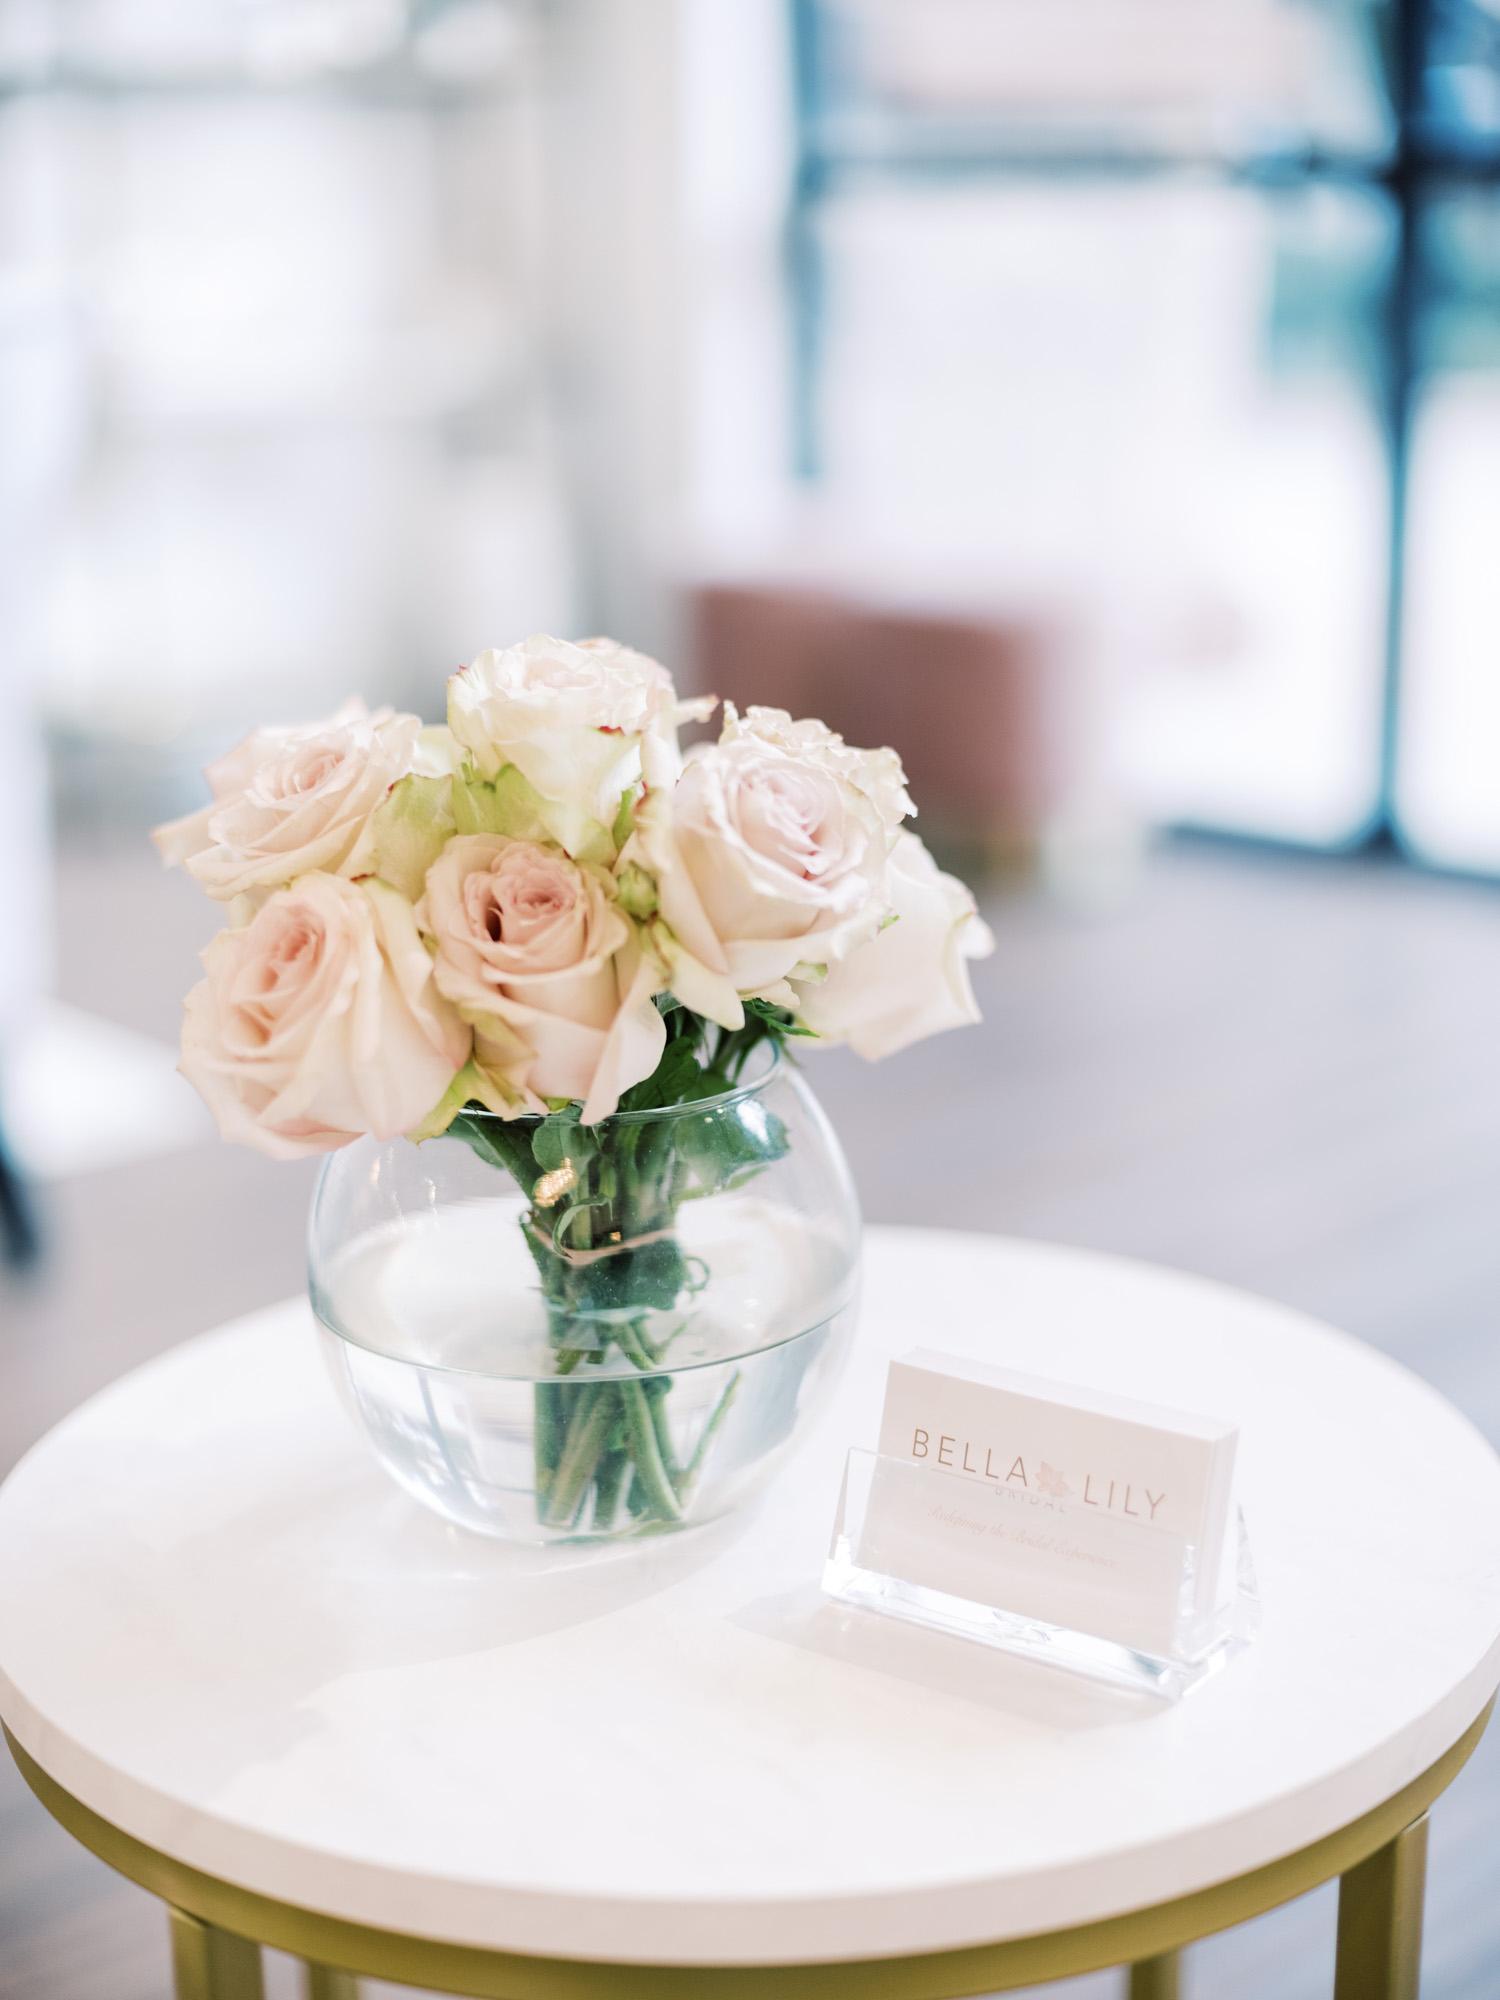 bella-lily-bridal-175.jpg